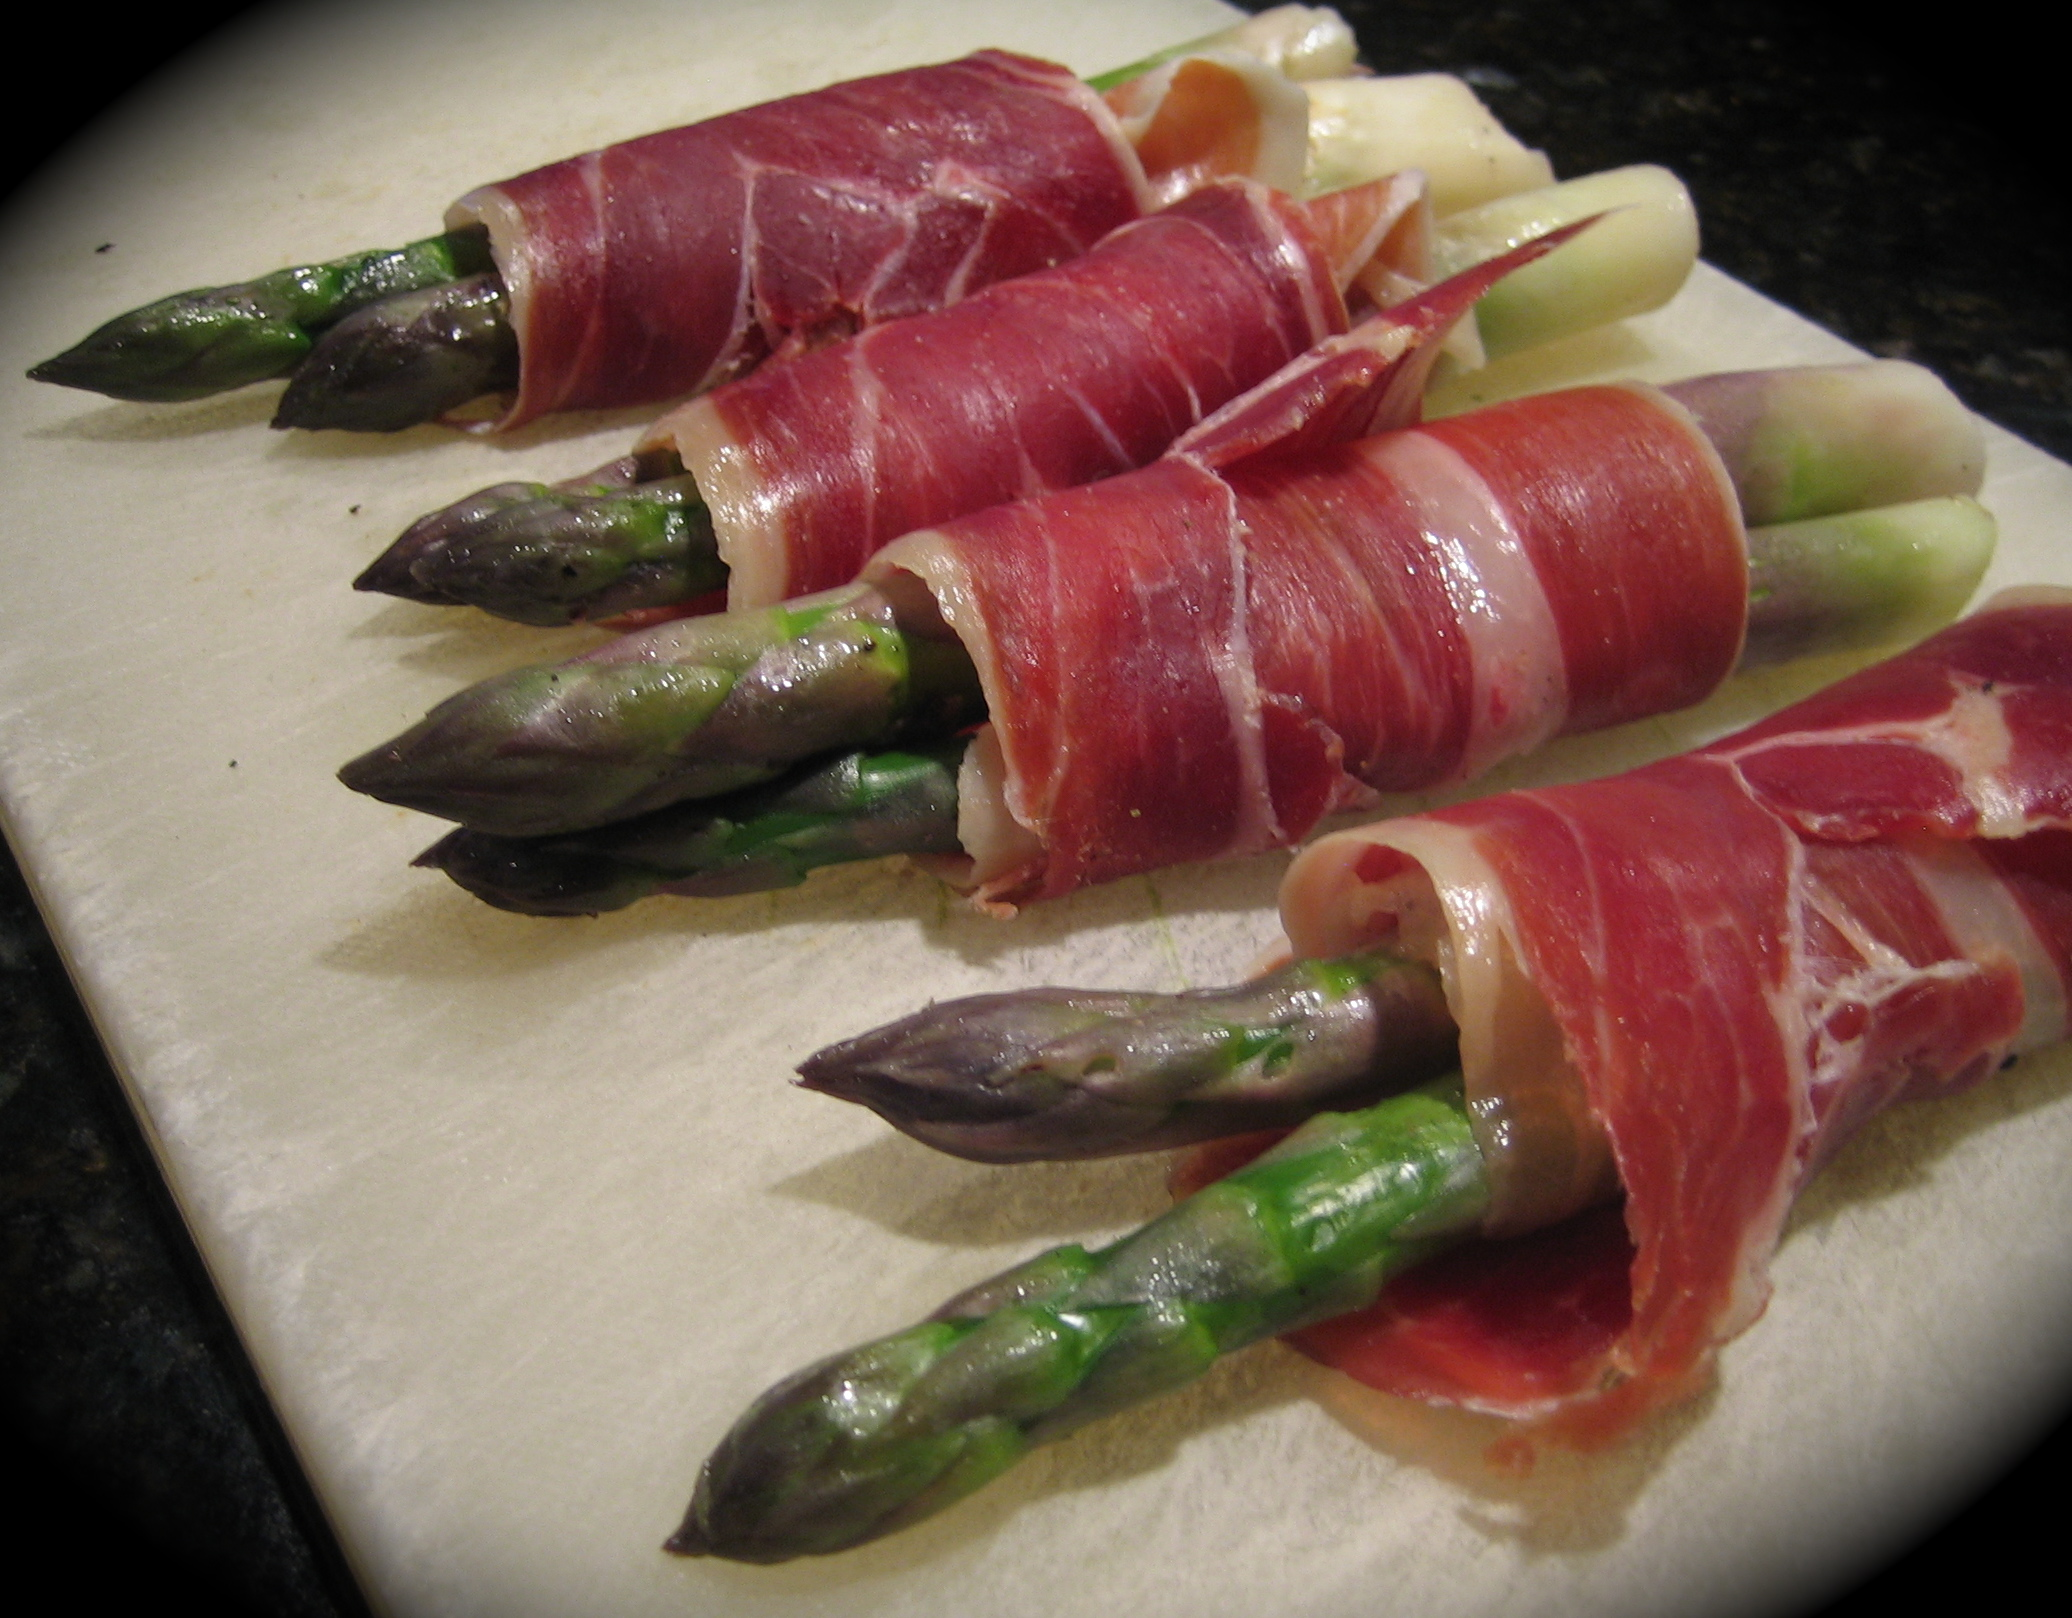 Asparagus Wrapped In Serrano Ham Recipes — Dishmaps